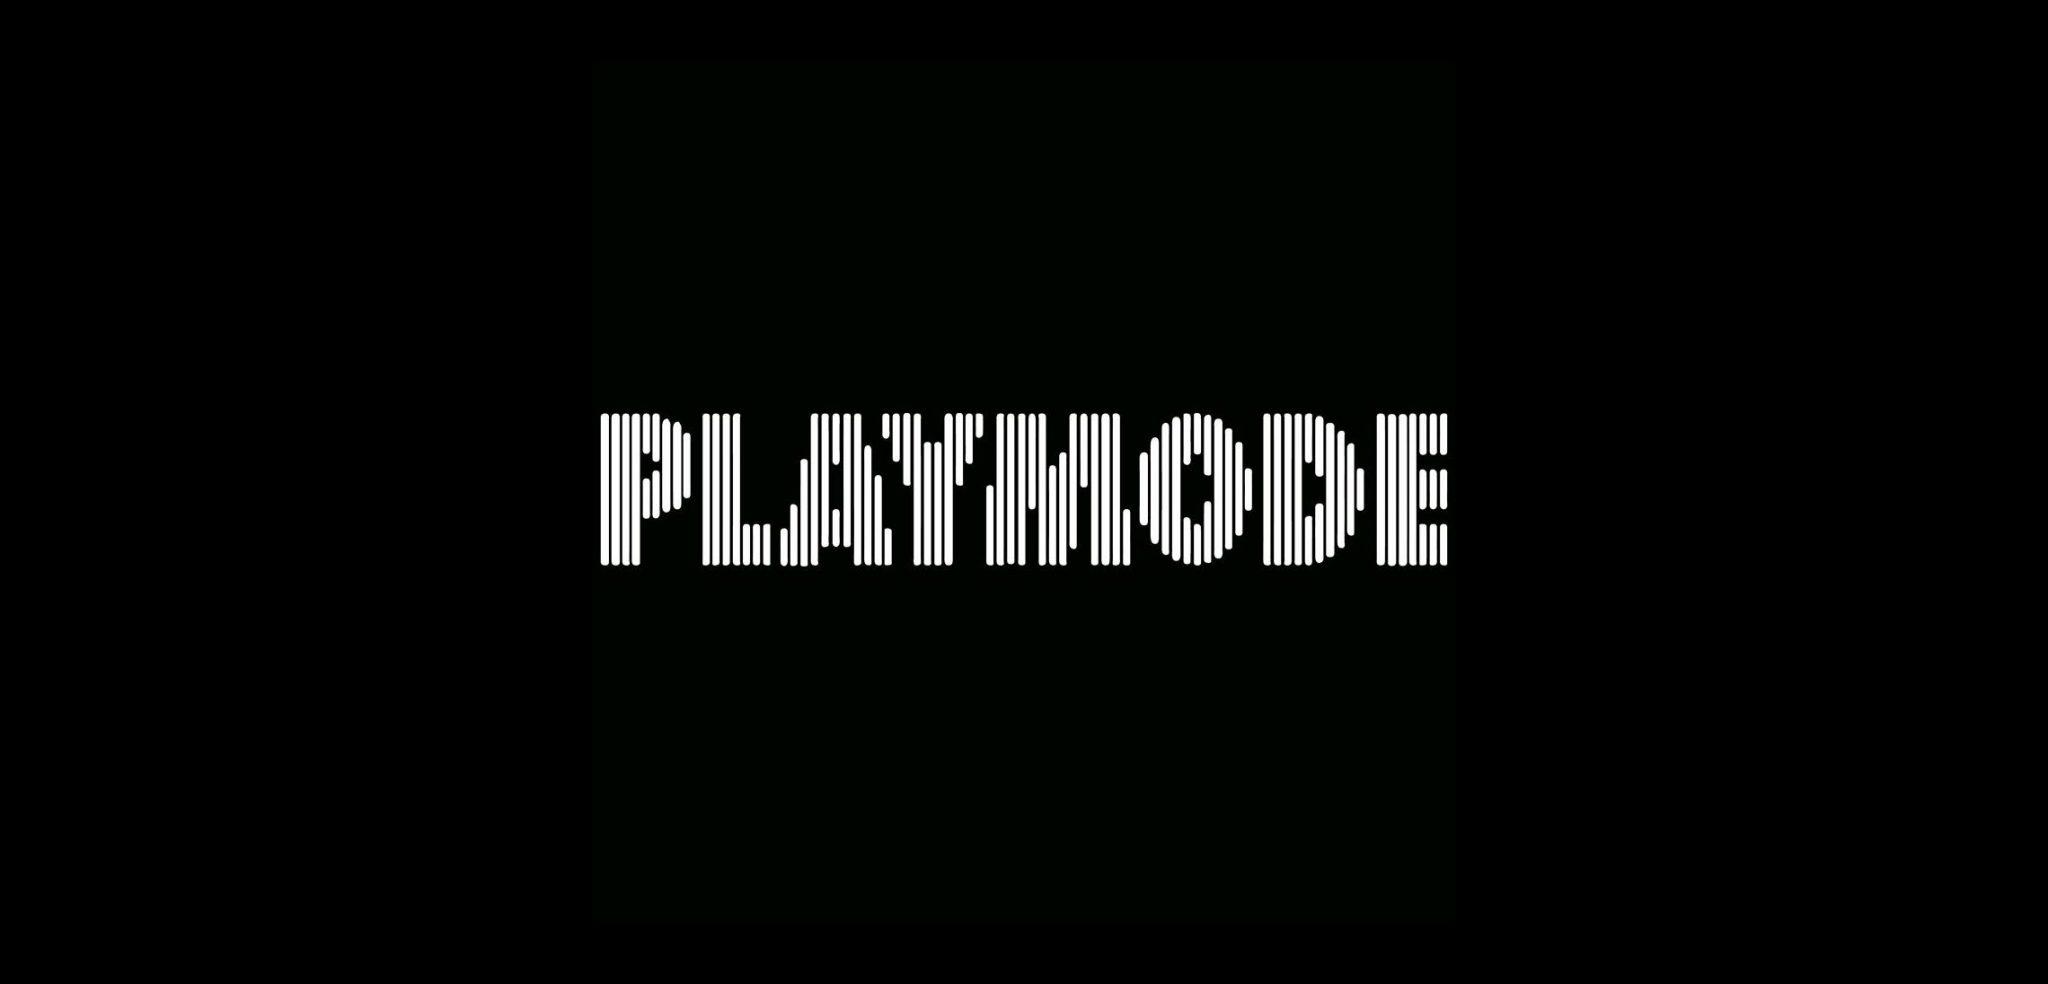 Playmode - I Want / Skies Above hero